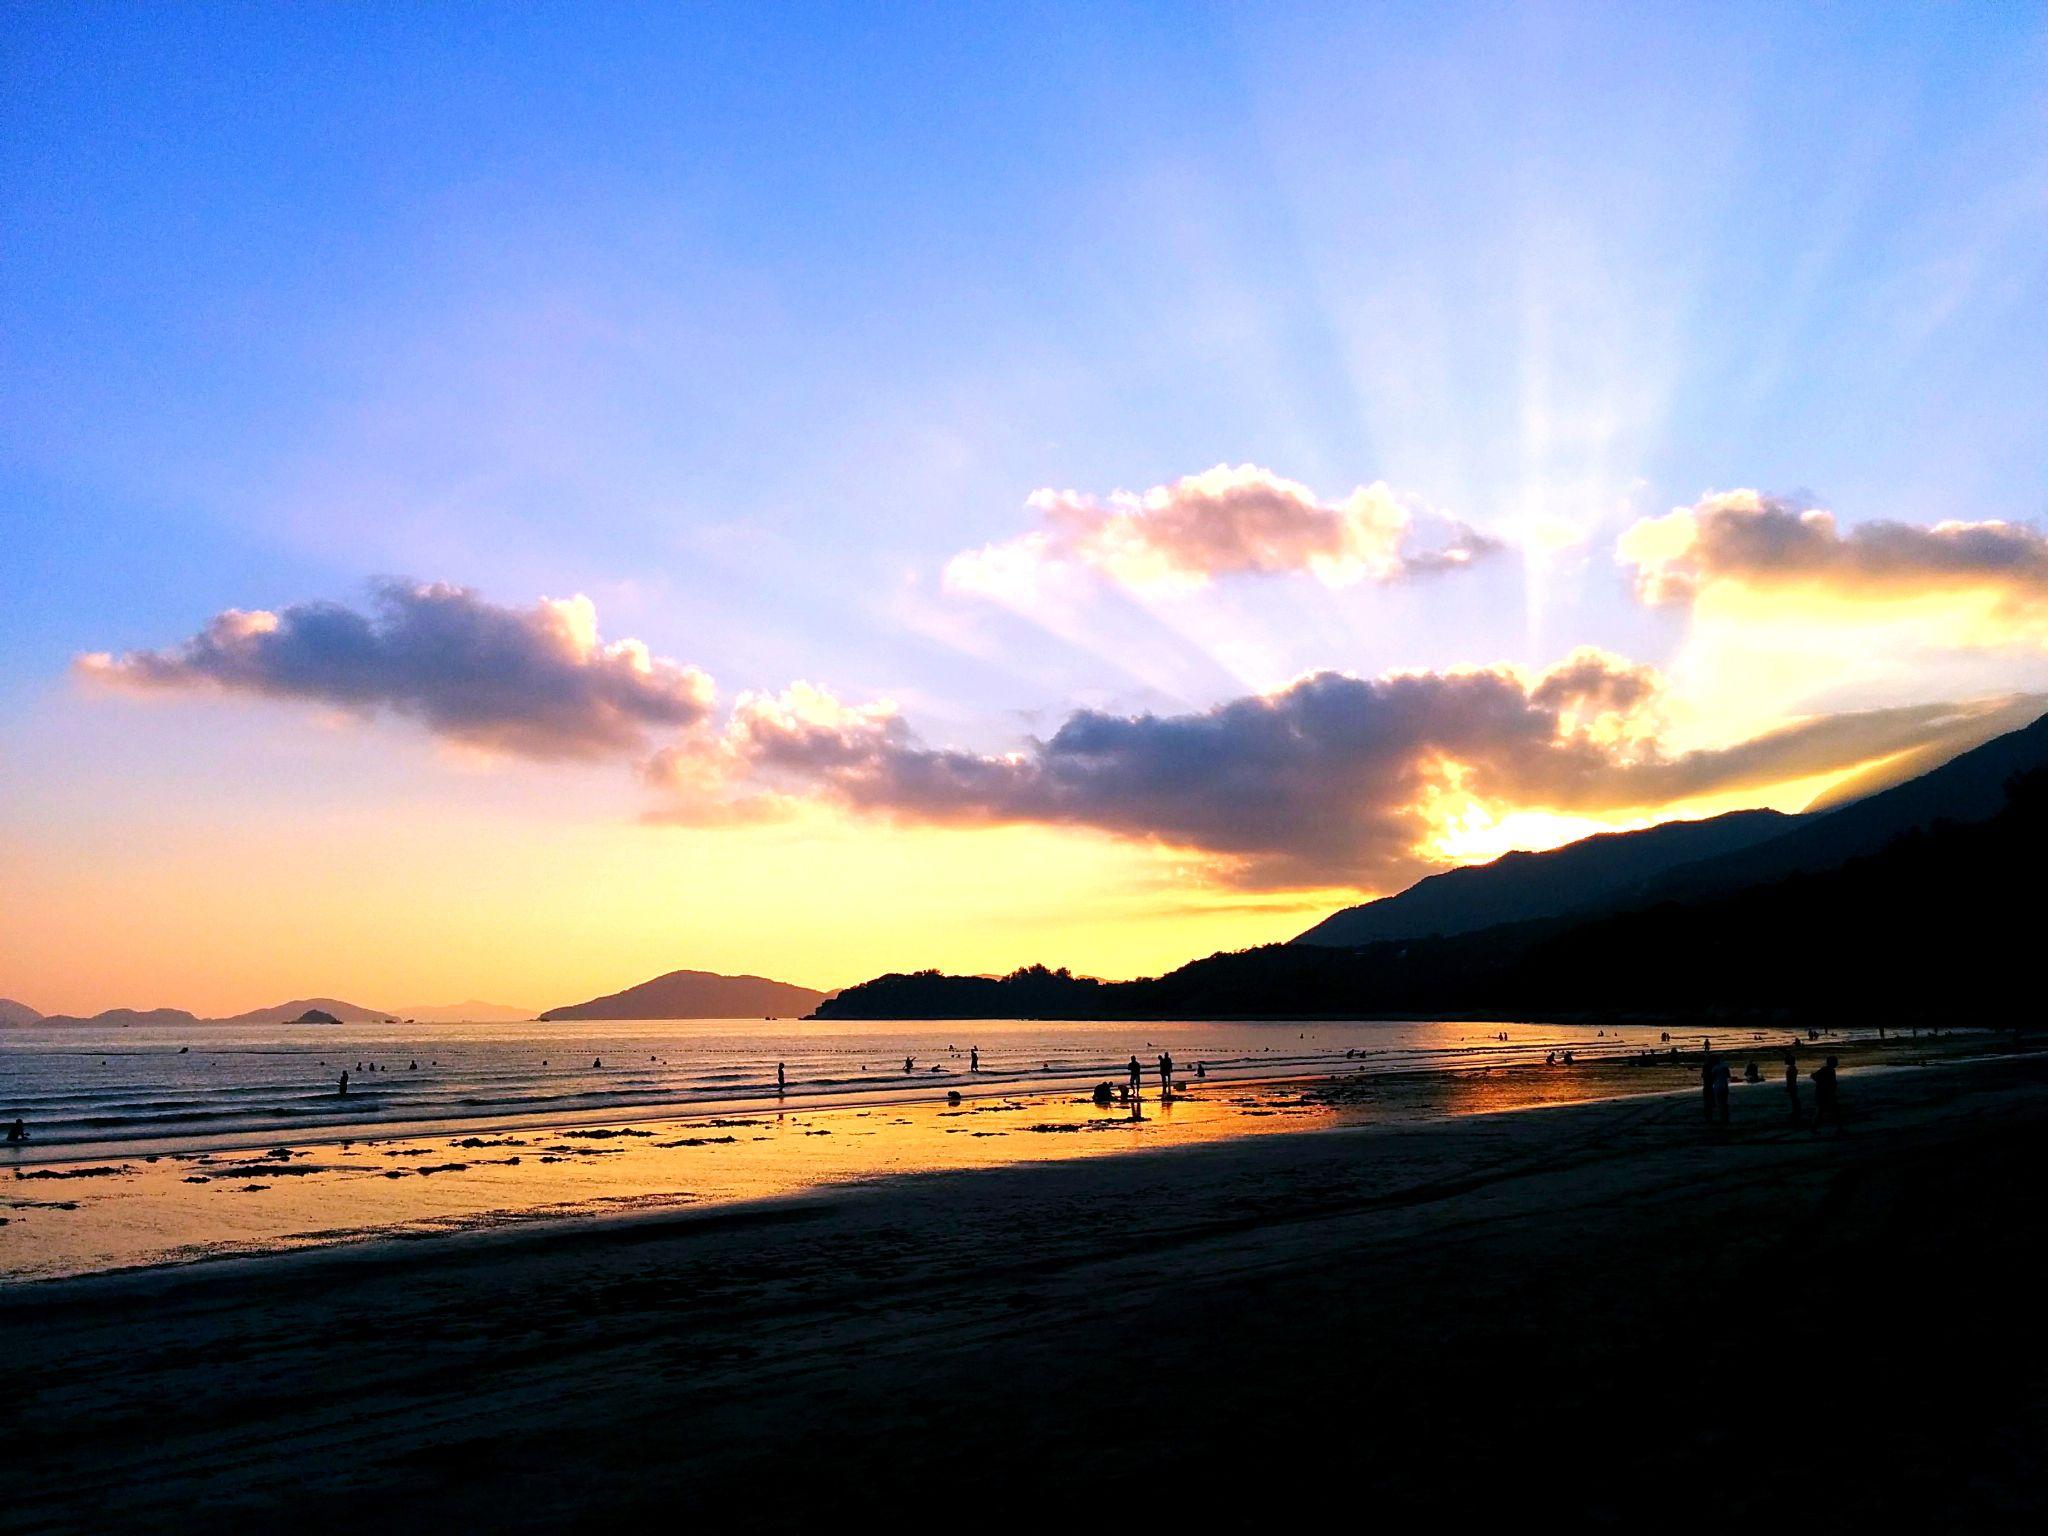 Pui O Beach in Hong Kong by leocary